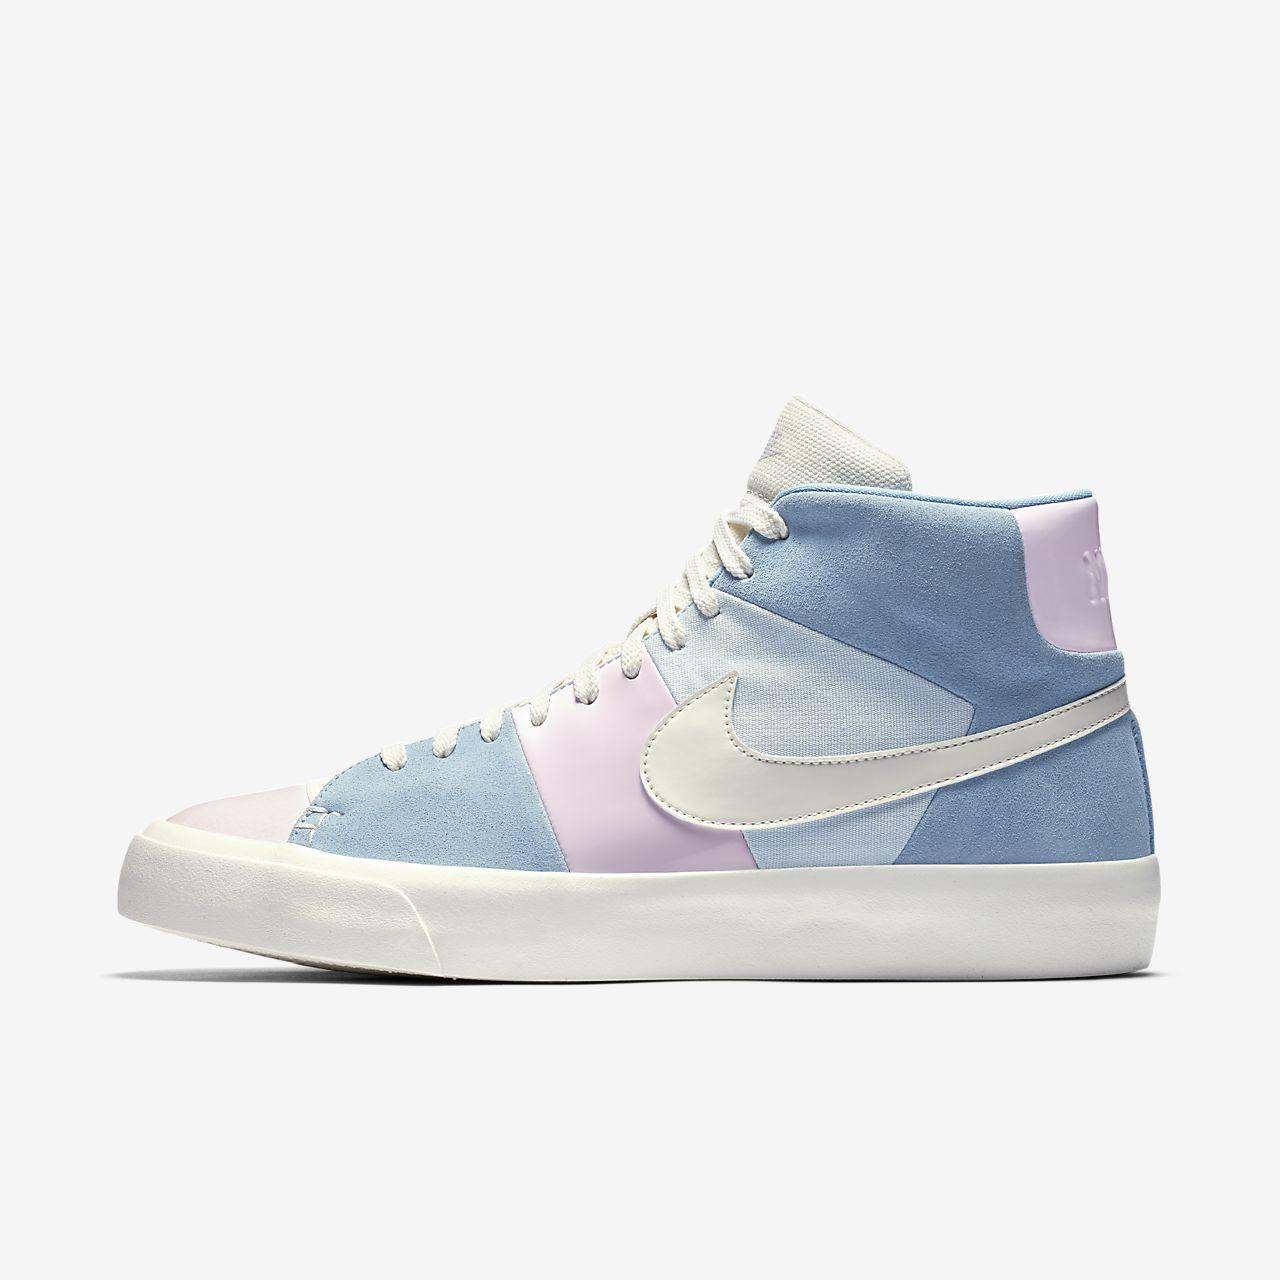 official photos 45c53 efcc9 Nike Blazer Royal Easter QS Herenschoen